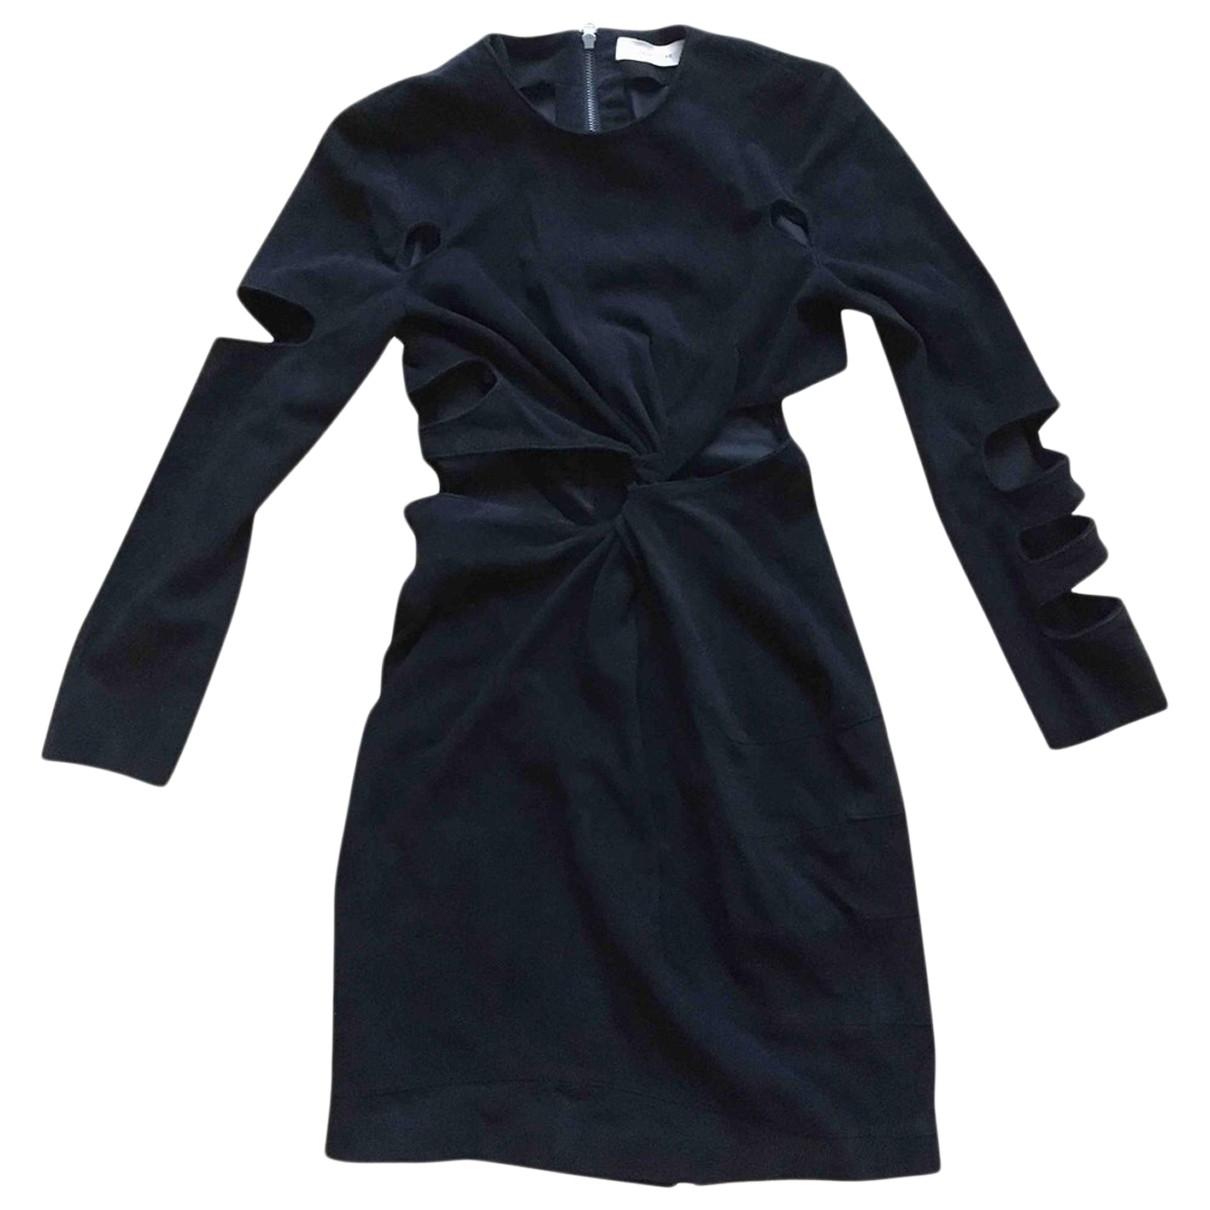 Preen \N Kleid in  Schwarz Veloursleder